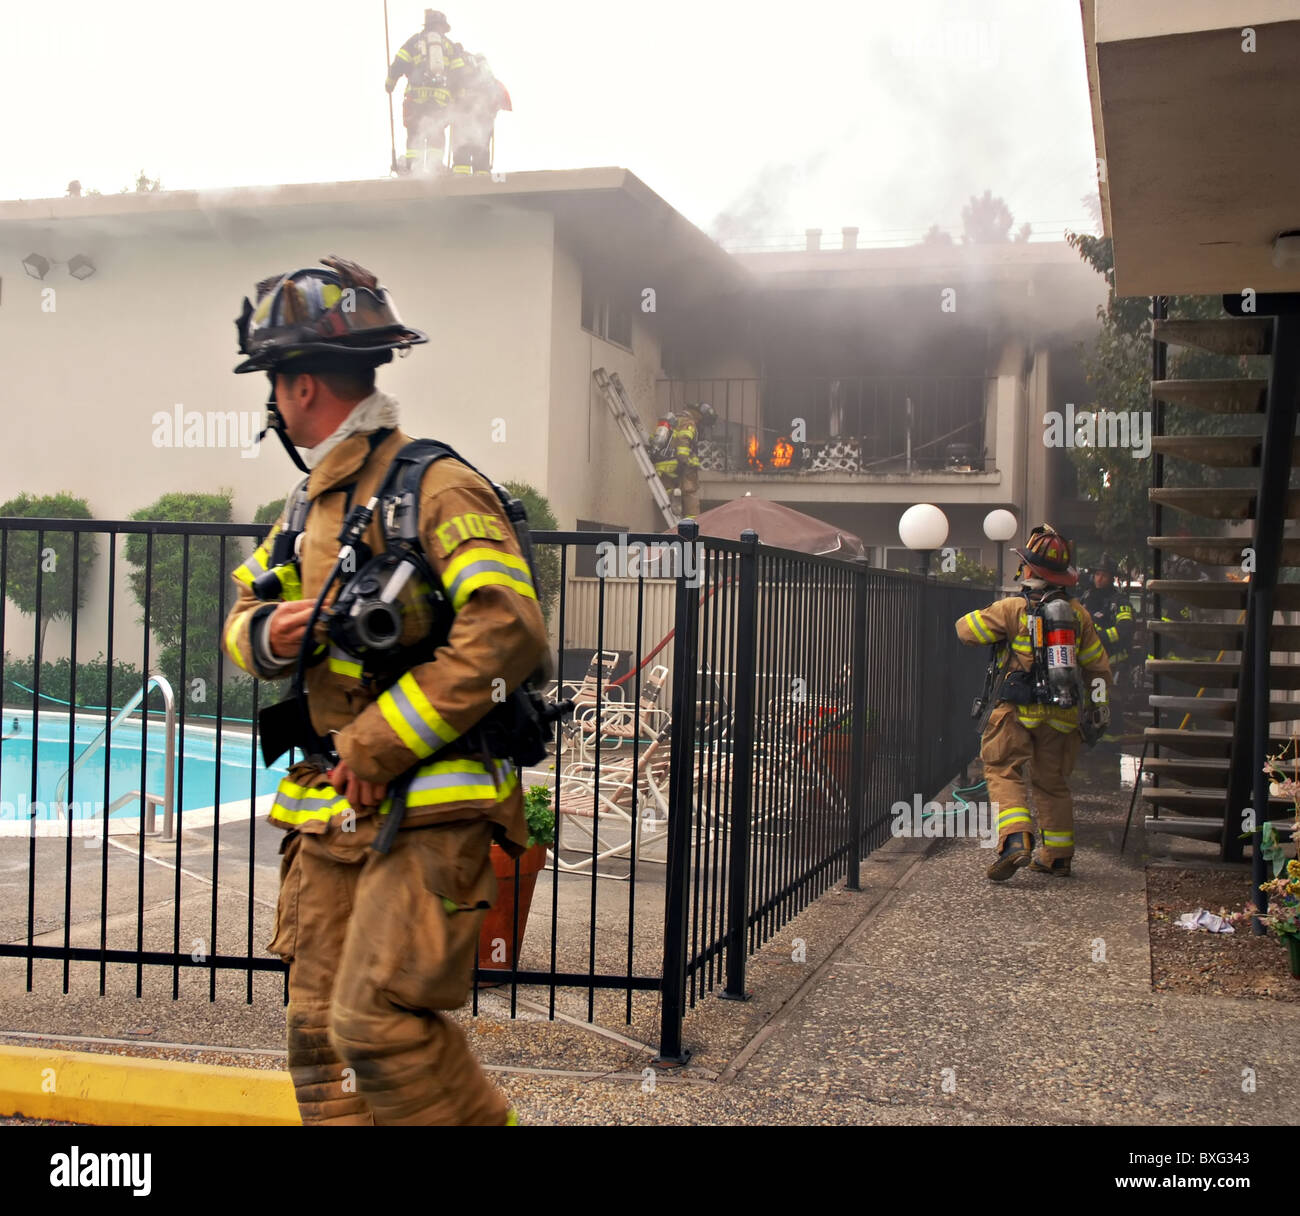 SACRAMENTO, CA - August 28, 2010: Sacramento Metro Fire District firefighters rush to rescue Stock Photo